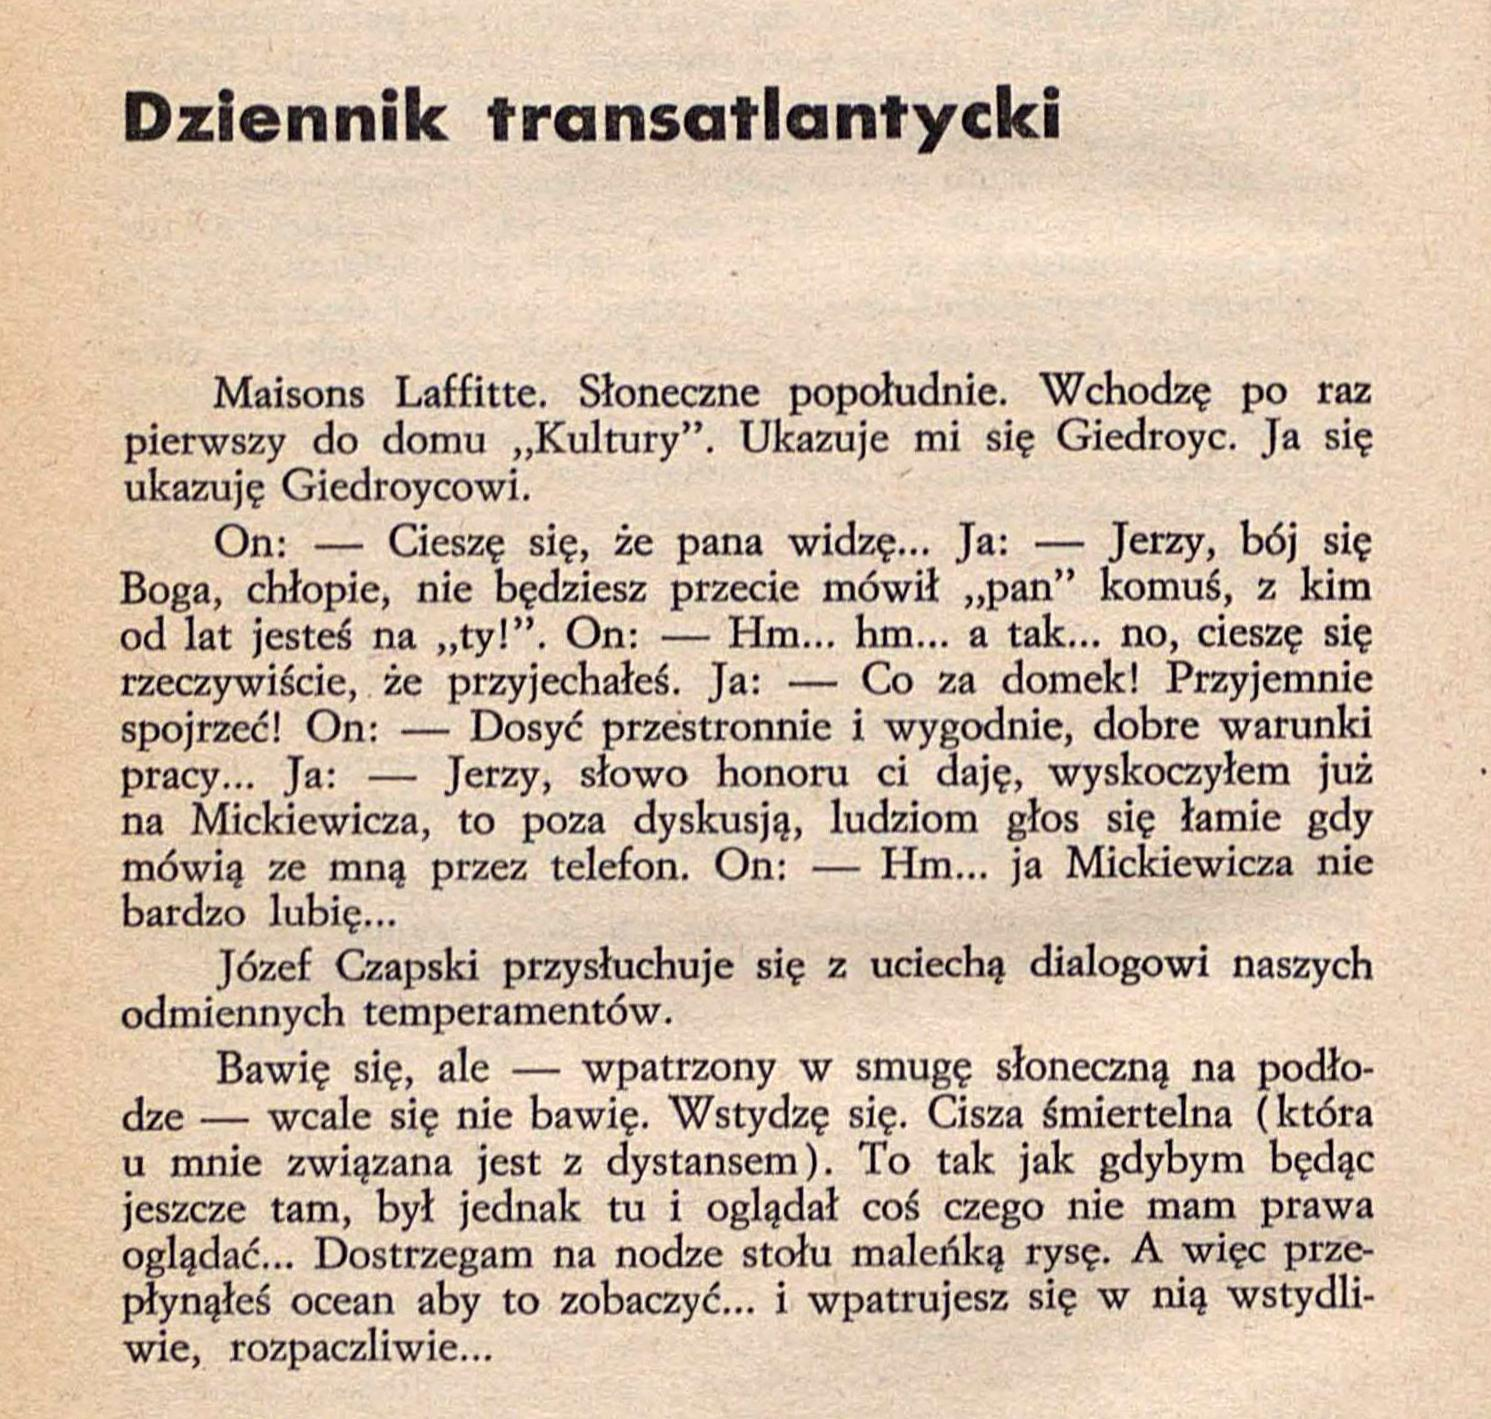 "<div class='inner-box'><div class='close-desc'></div><span class='opis'>Fragment ""Dziennika transatlantyckiego"" Witolda Gombrowicza. Pierwsze chwile w Maisons-Laffitte. ""Kultura"" nr 11/193, 1963 r., s. 24</span><div class='clearfix'></div><span>Sygn. sm00033</span><div class='clearfix'></div><span>© Instytut Literacki</span></div>"